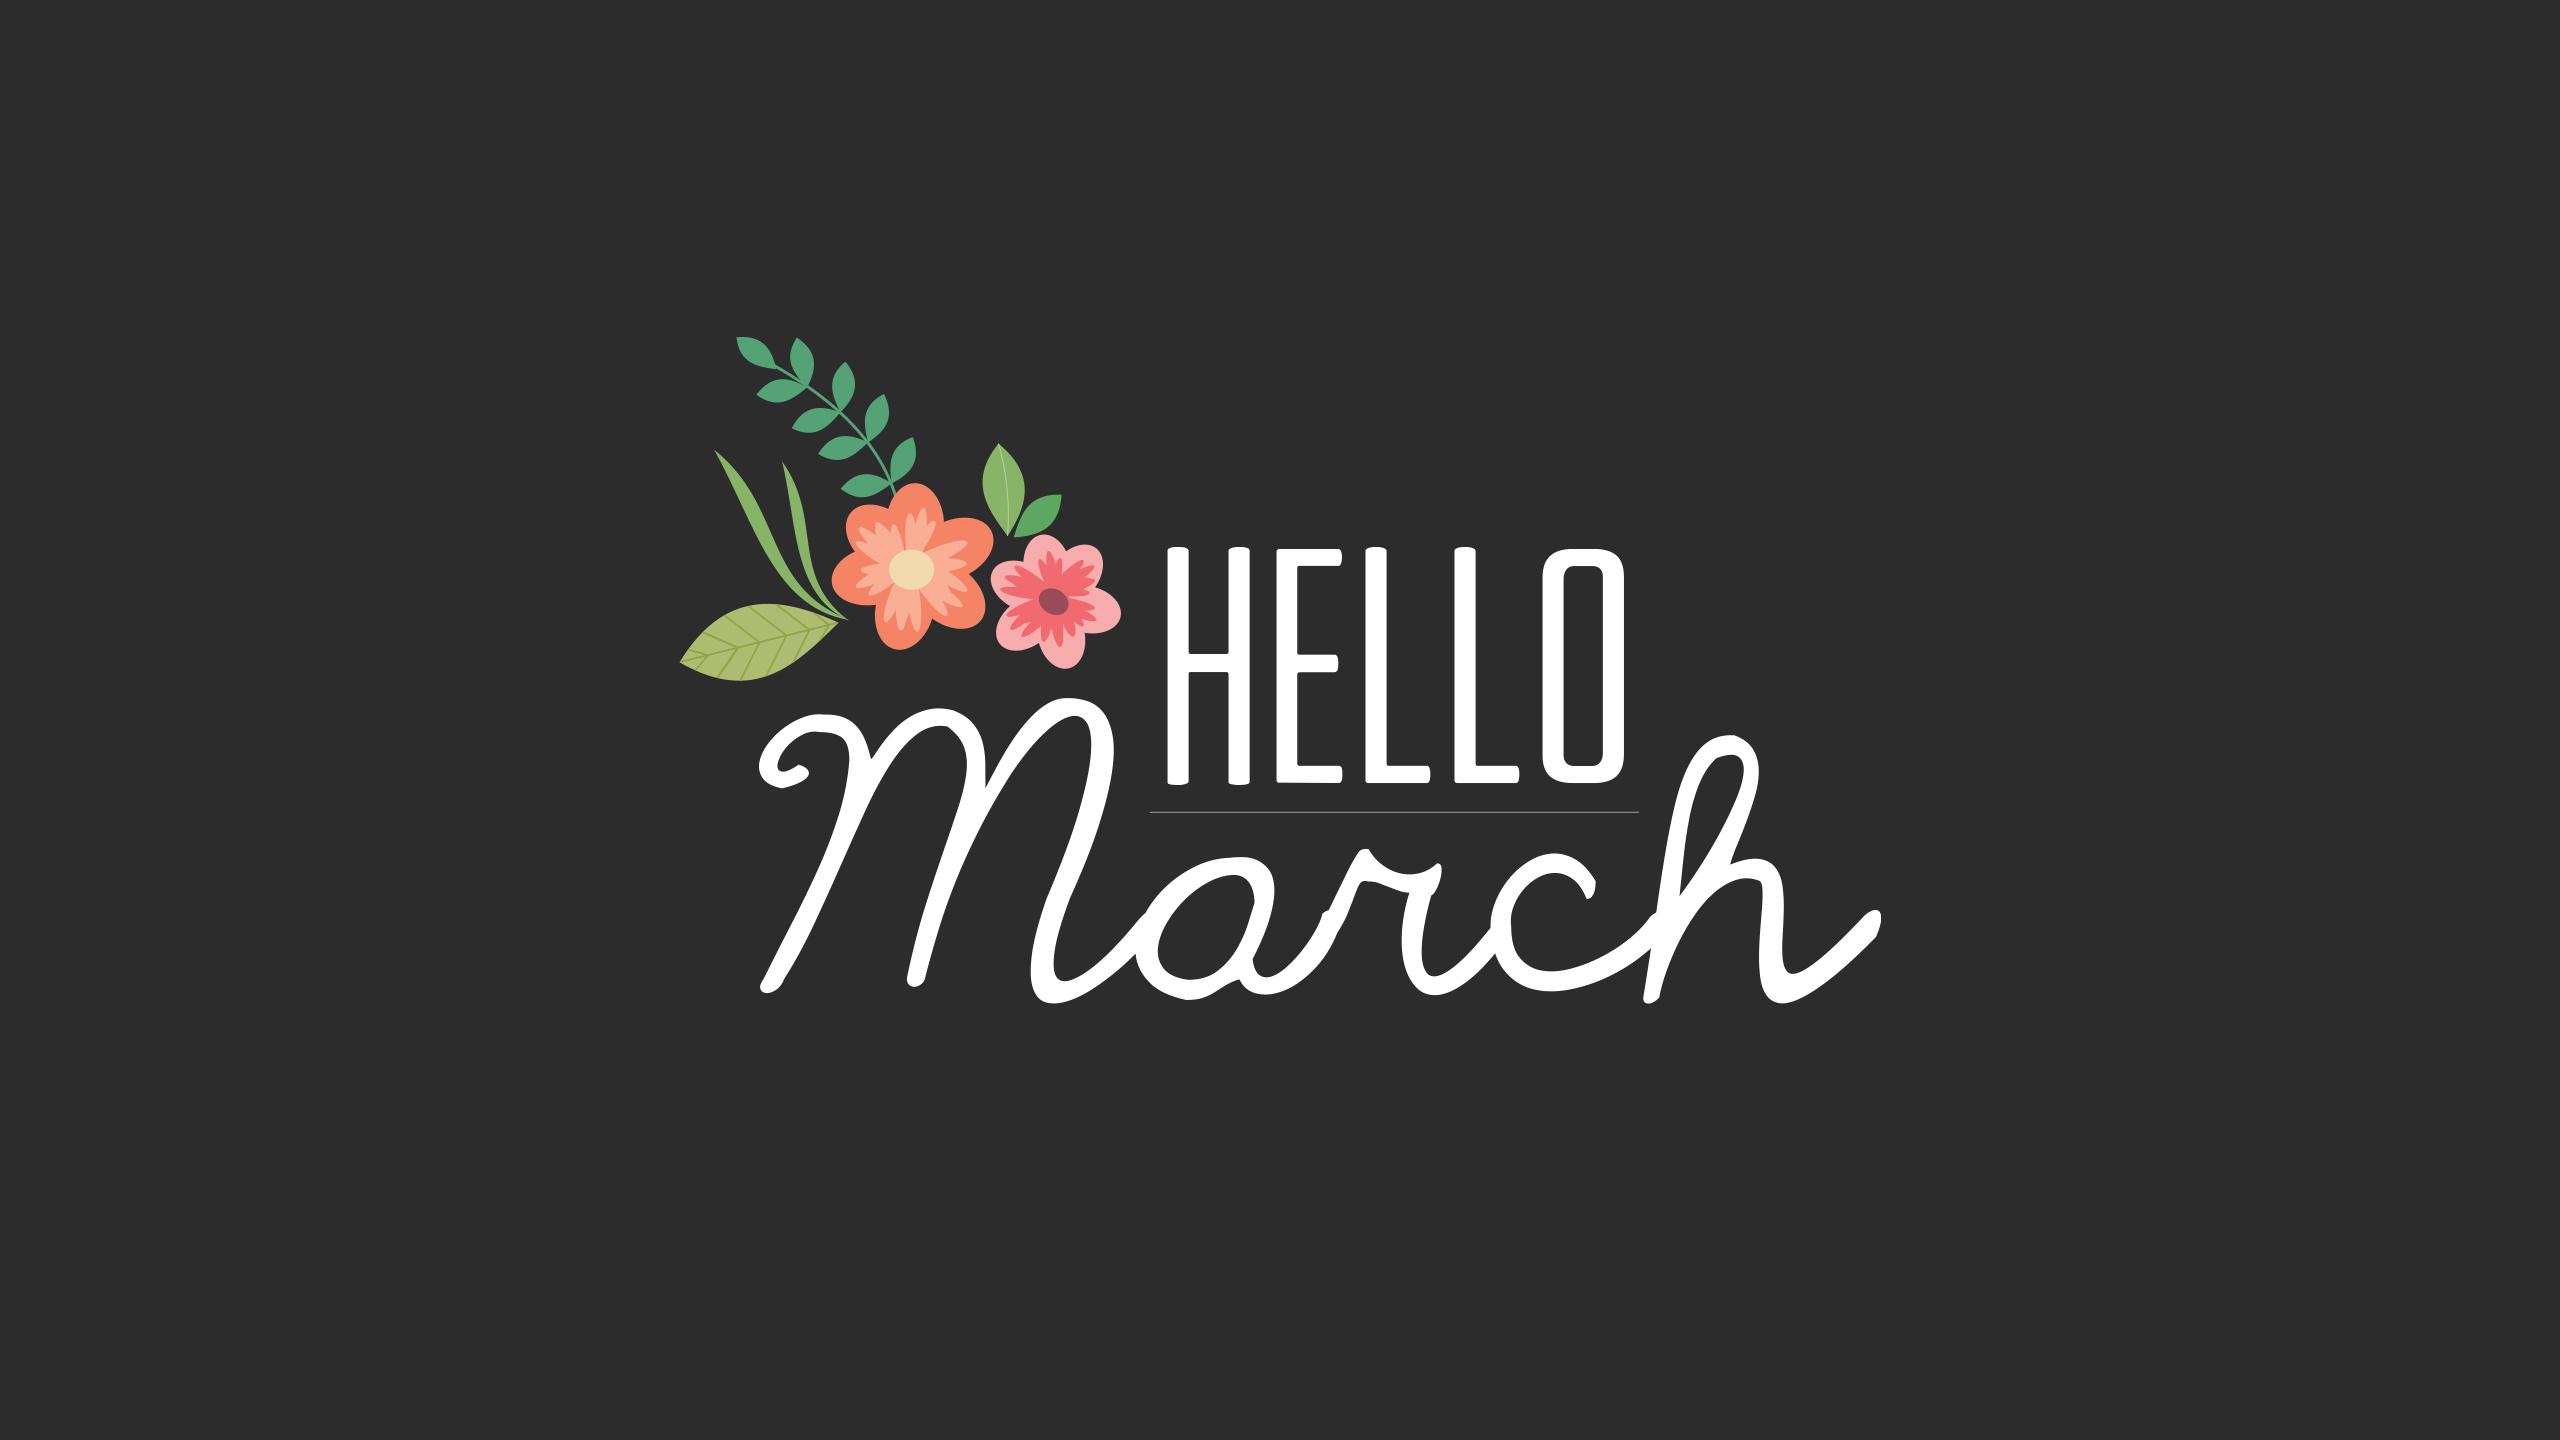 hello-march-gallery - La La Mer by Marianna Hewitt